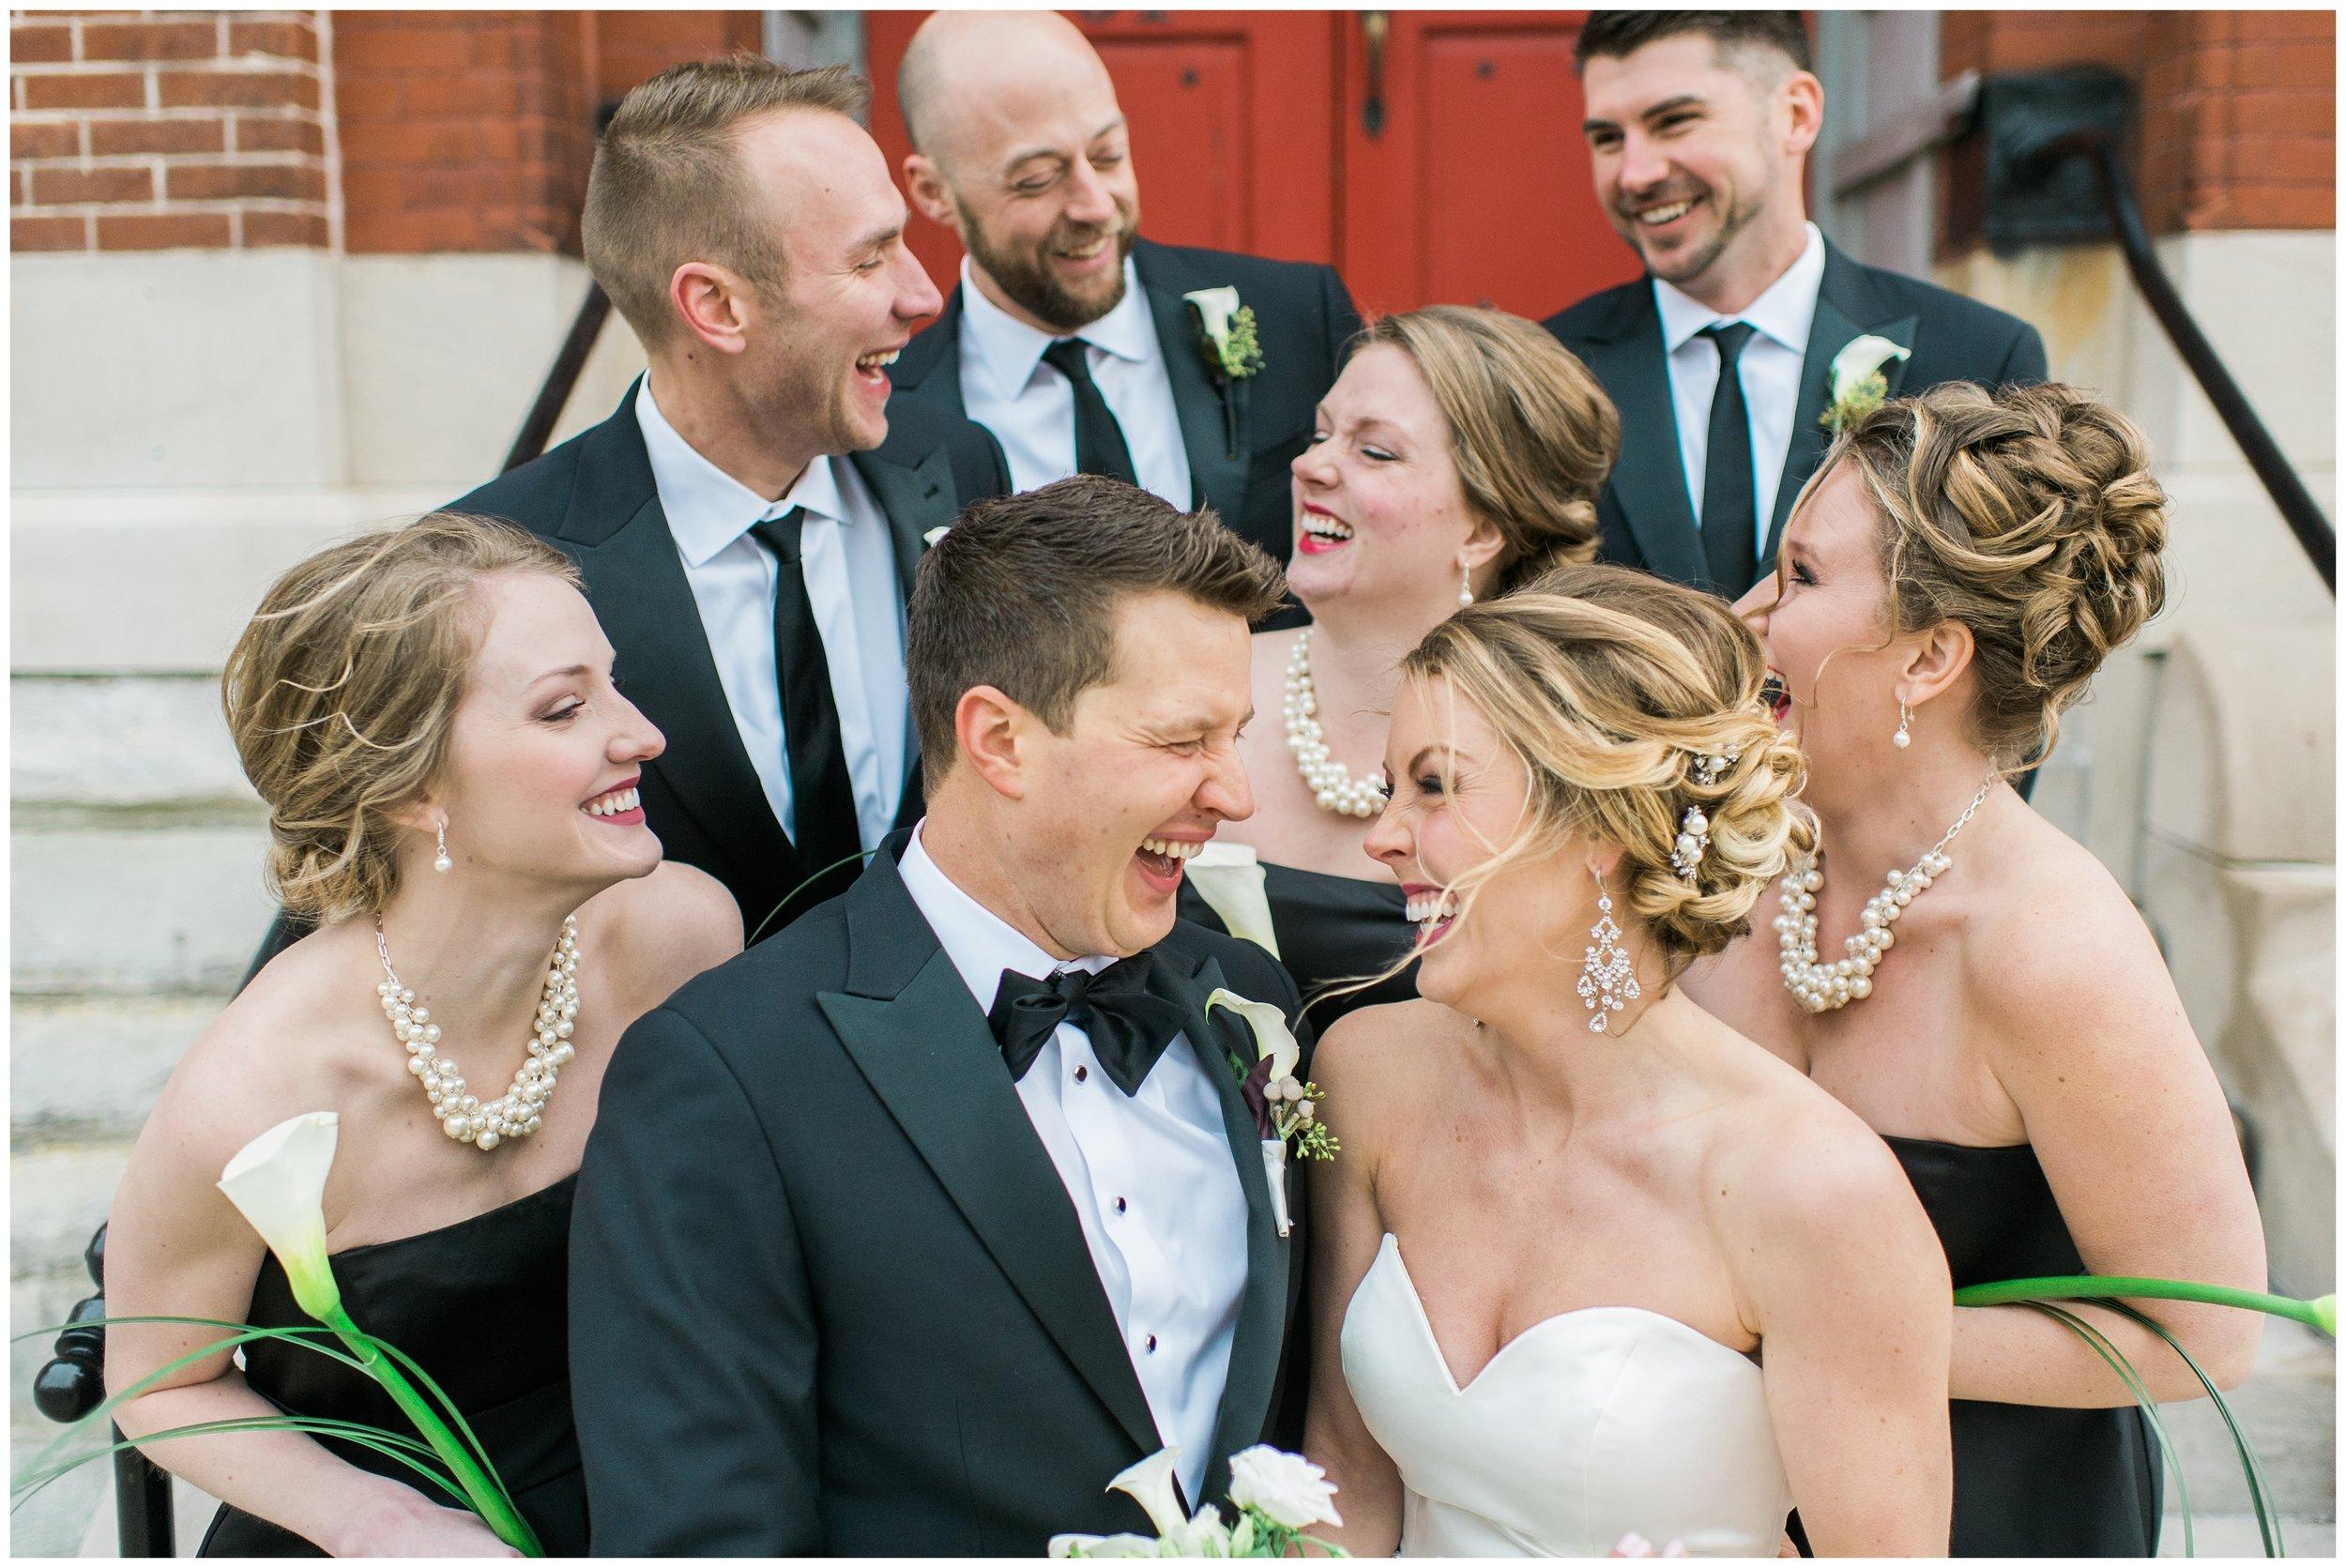 Rebecca_Bridges_Photography_Indianapolis_Wedding_Photographer_5822.jpg